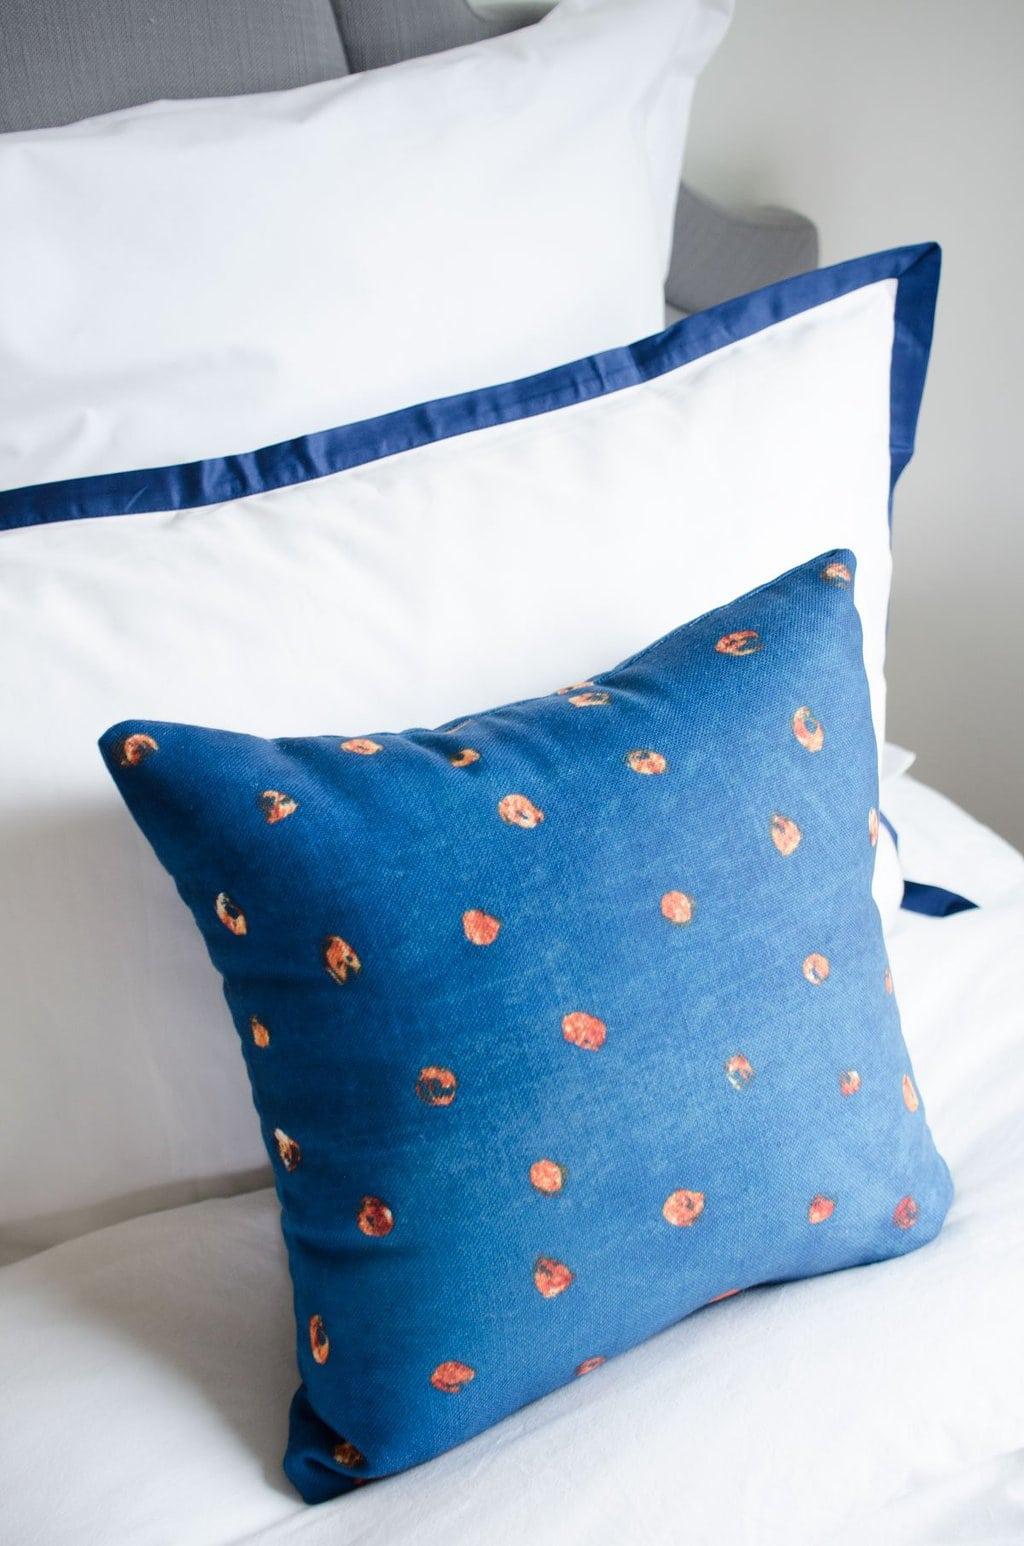 Gold dot blue throw pillow via @thouswellblog